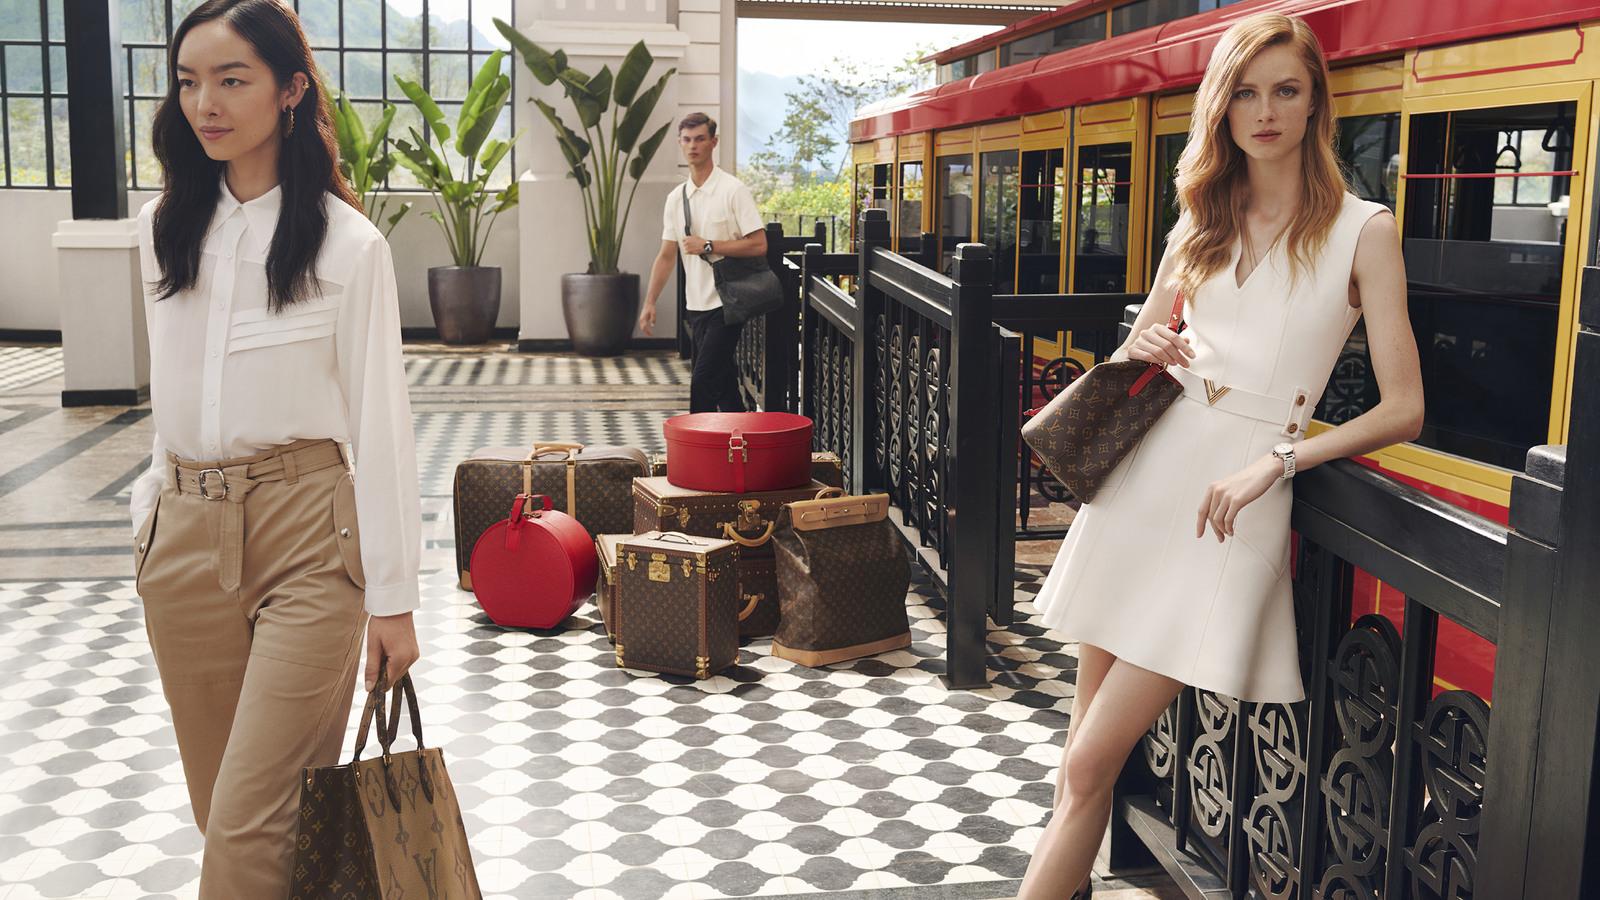 louis vuitton - 6 1568261405 - Việt Nam tuyệt đẹp trong quảng cáo mới của Louis Vuitton